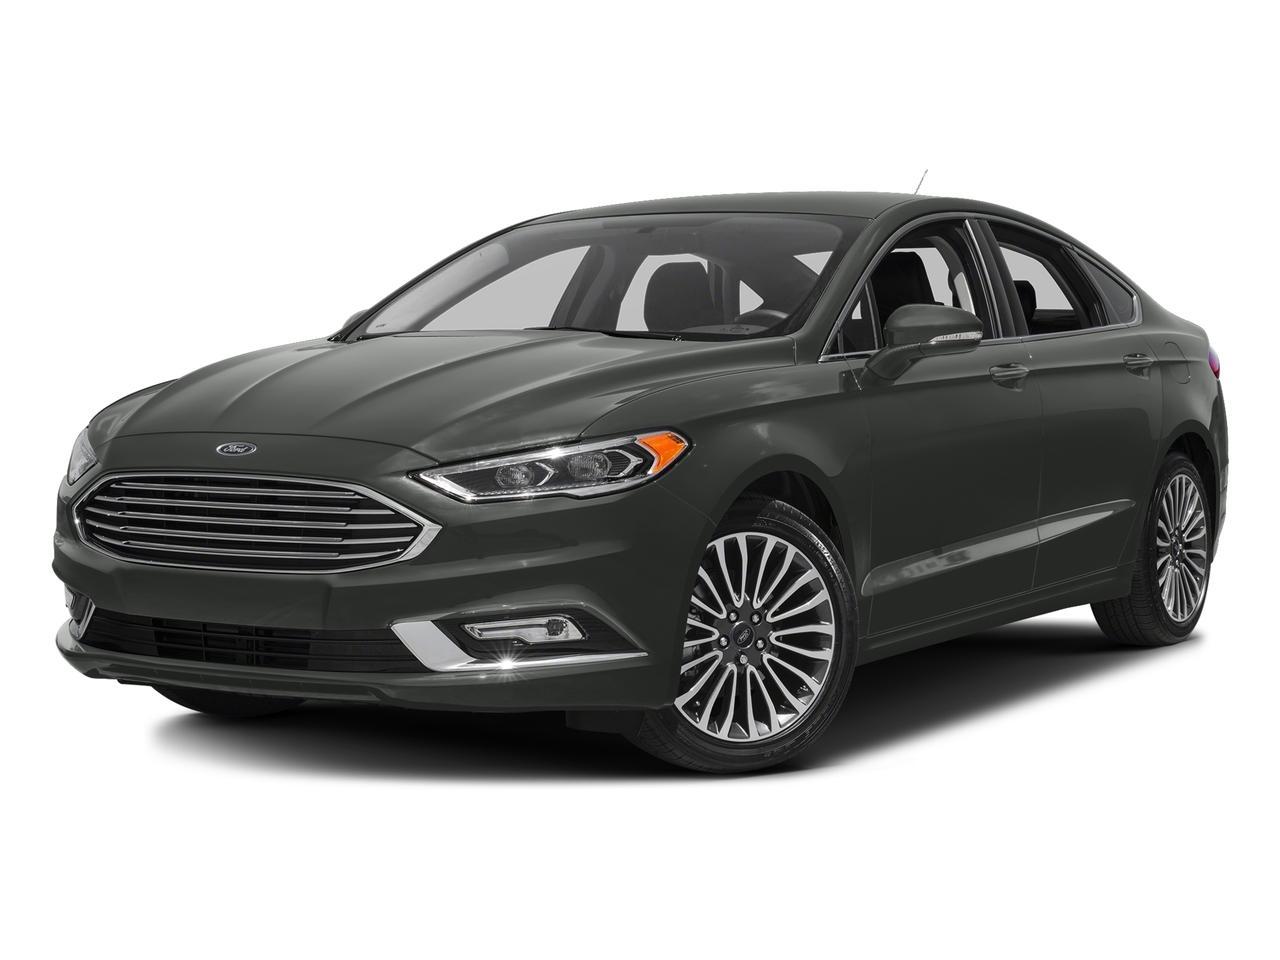 2018 Ford Fusion Vehicle Photo in Pleasanton, CA 94588